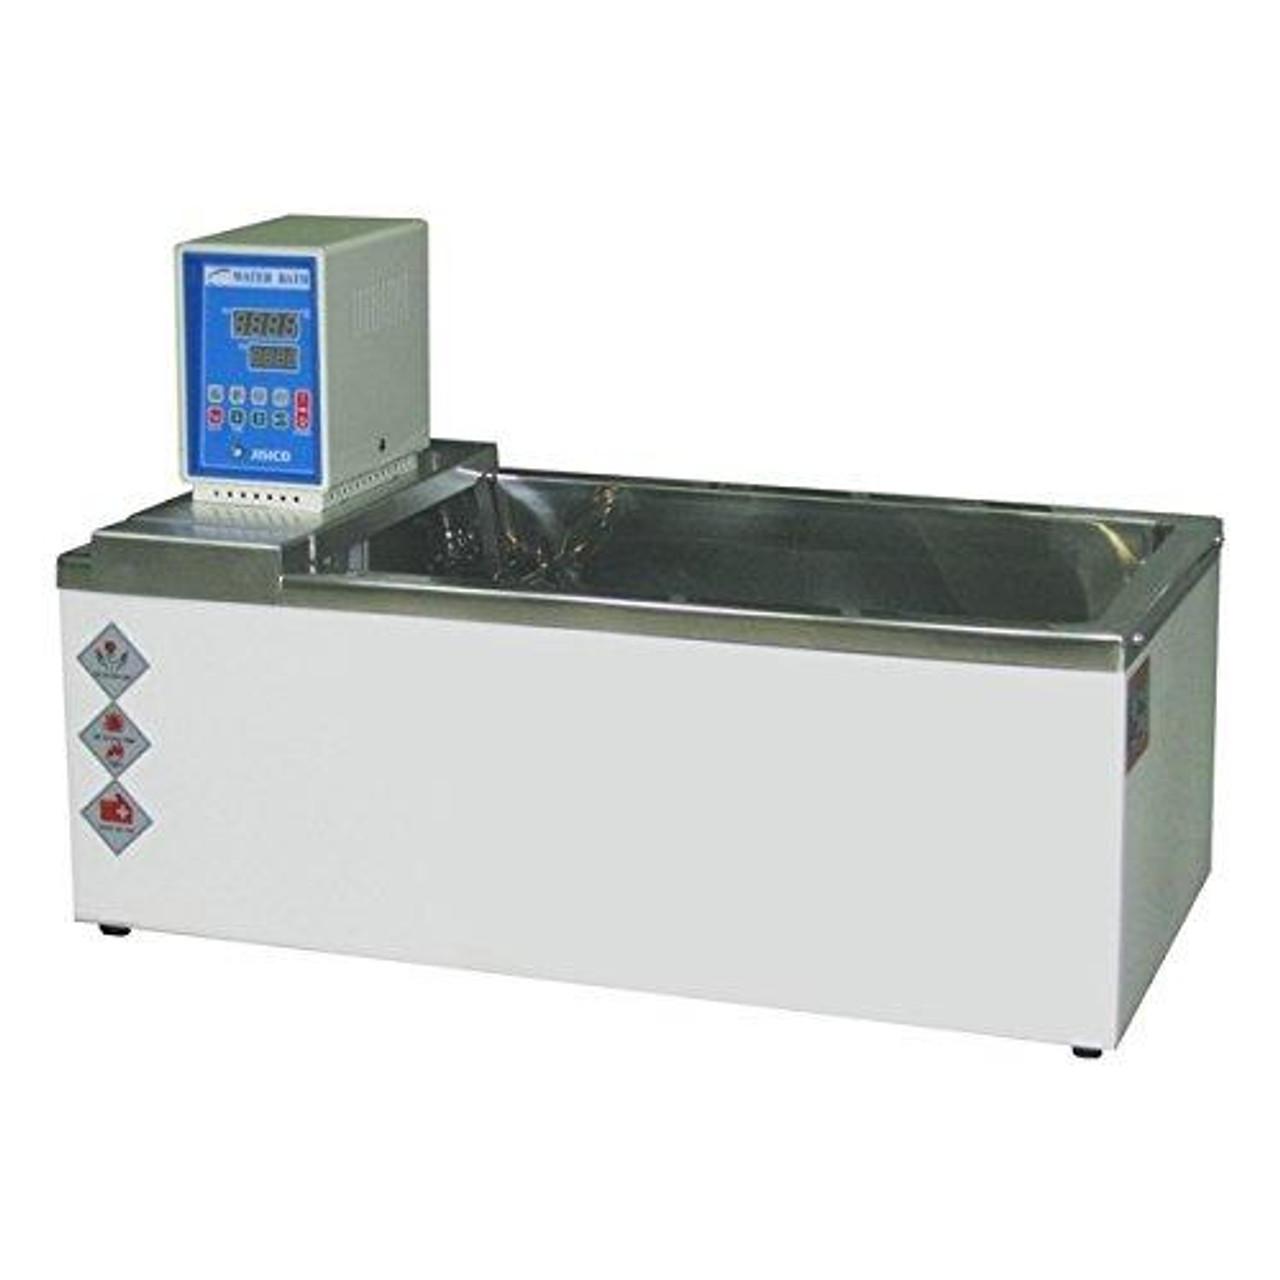 JISICO Immersion Circulating Water Bath. Capacity 15 lts temp range Ambient+5℃ ~ 90℃(Max.) Volt 110 / 60 Hz